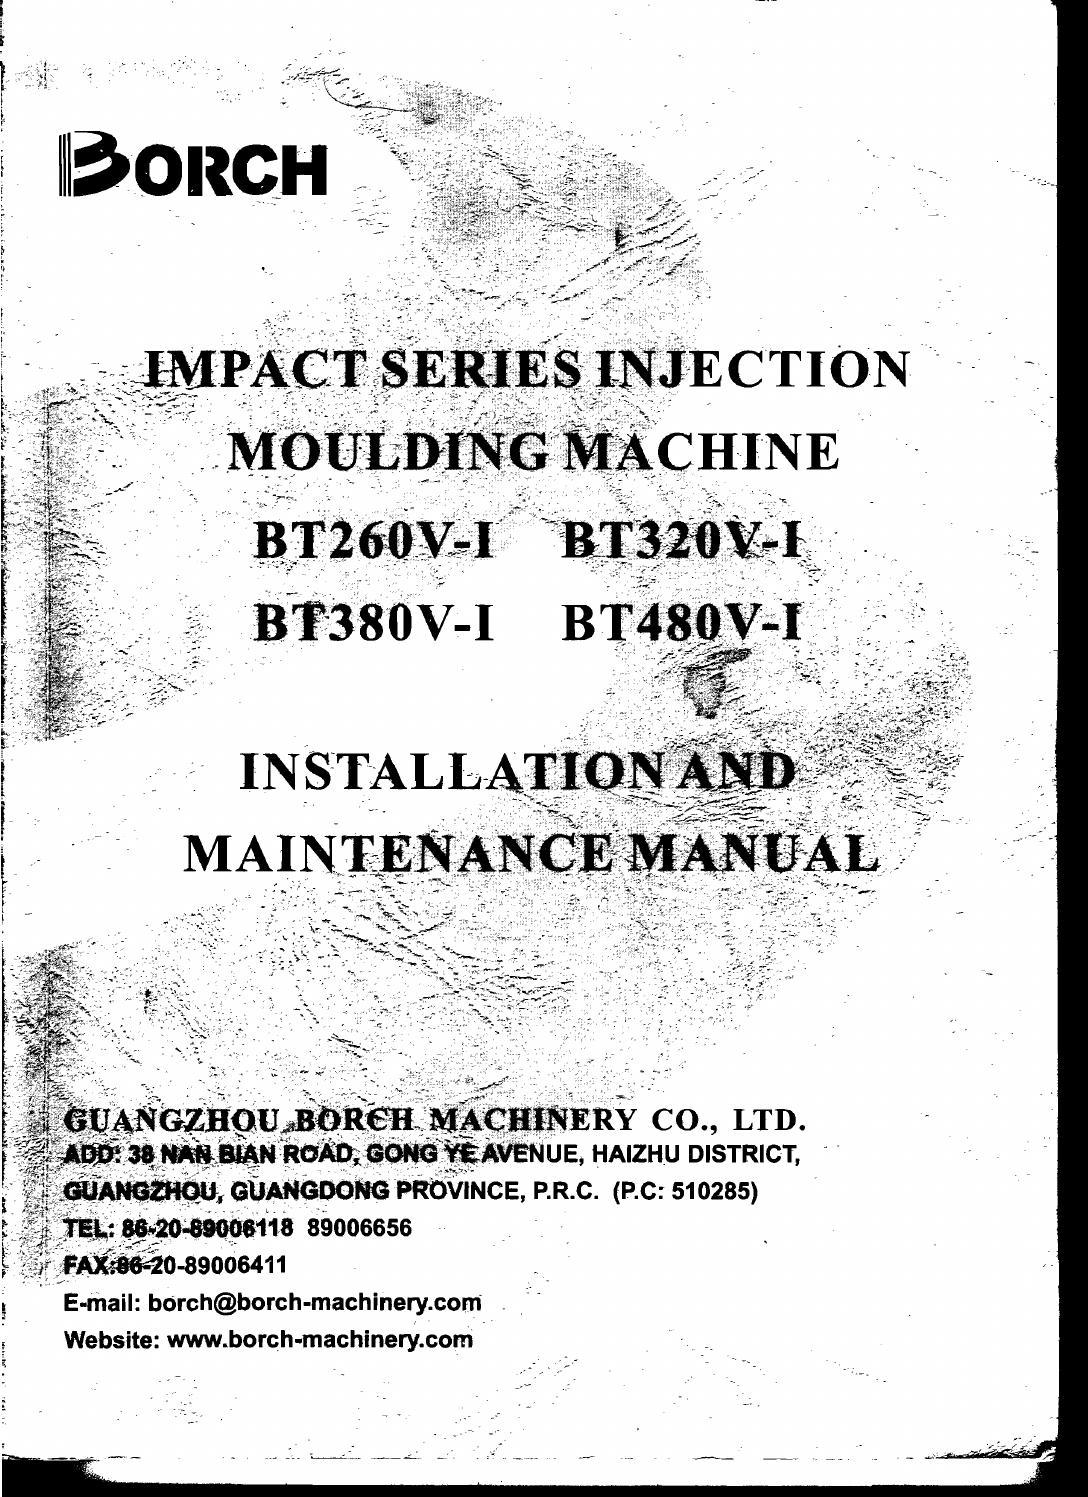 Borche installation and maintenance manual by Turan